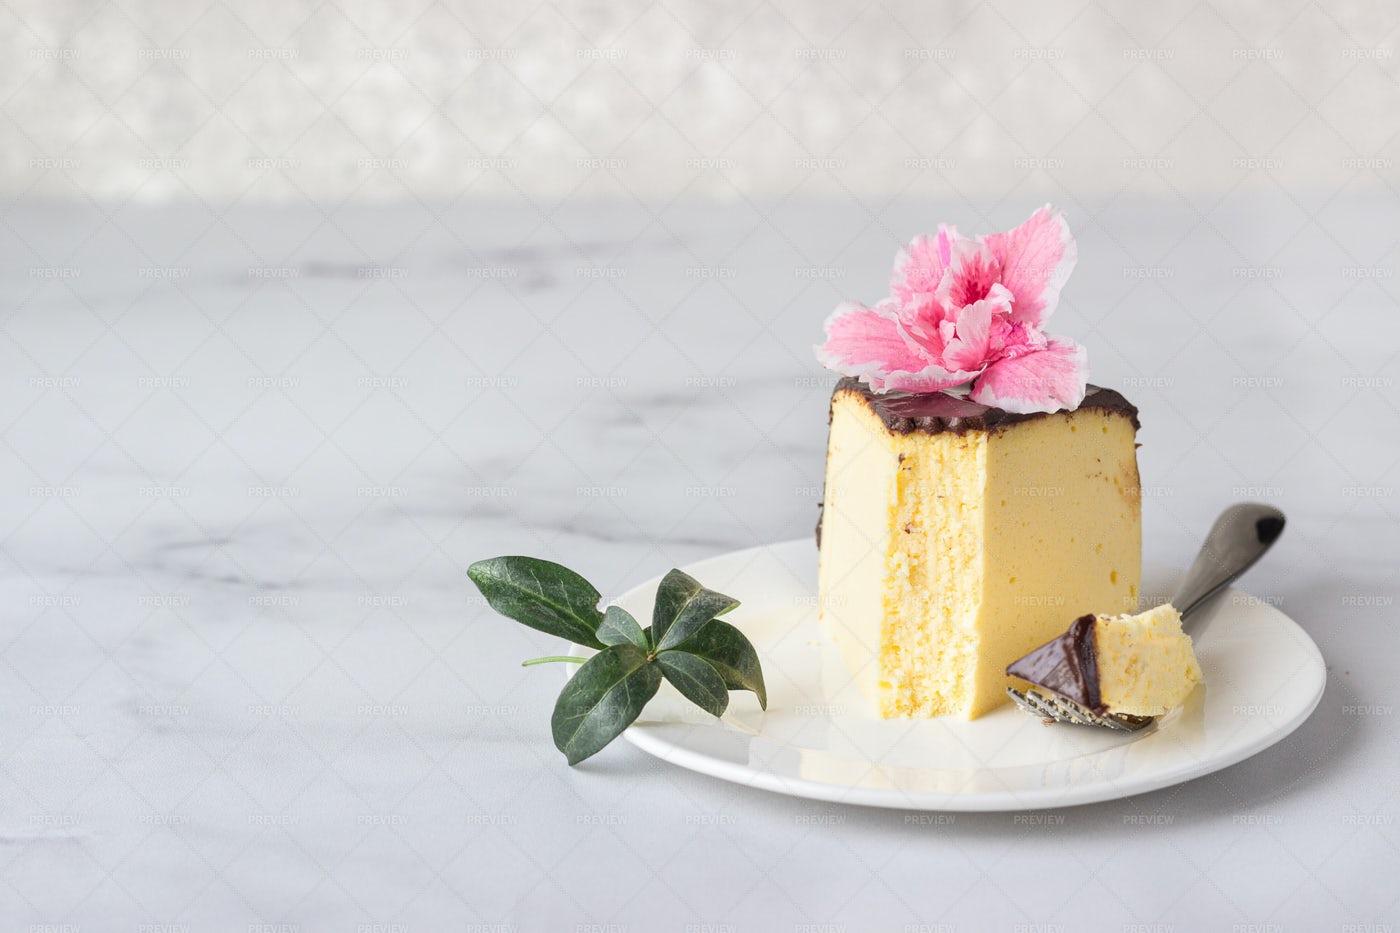 Piece Of Japanese Cheesecake: Stock Photos